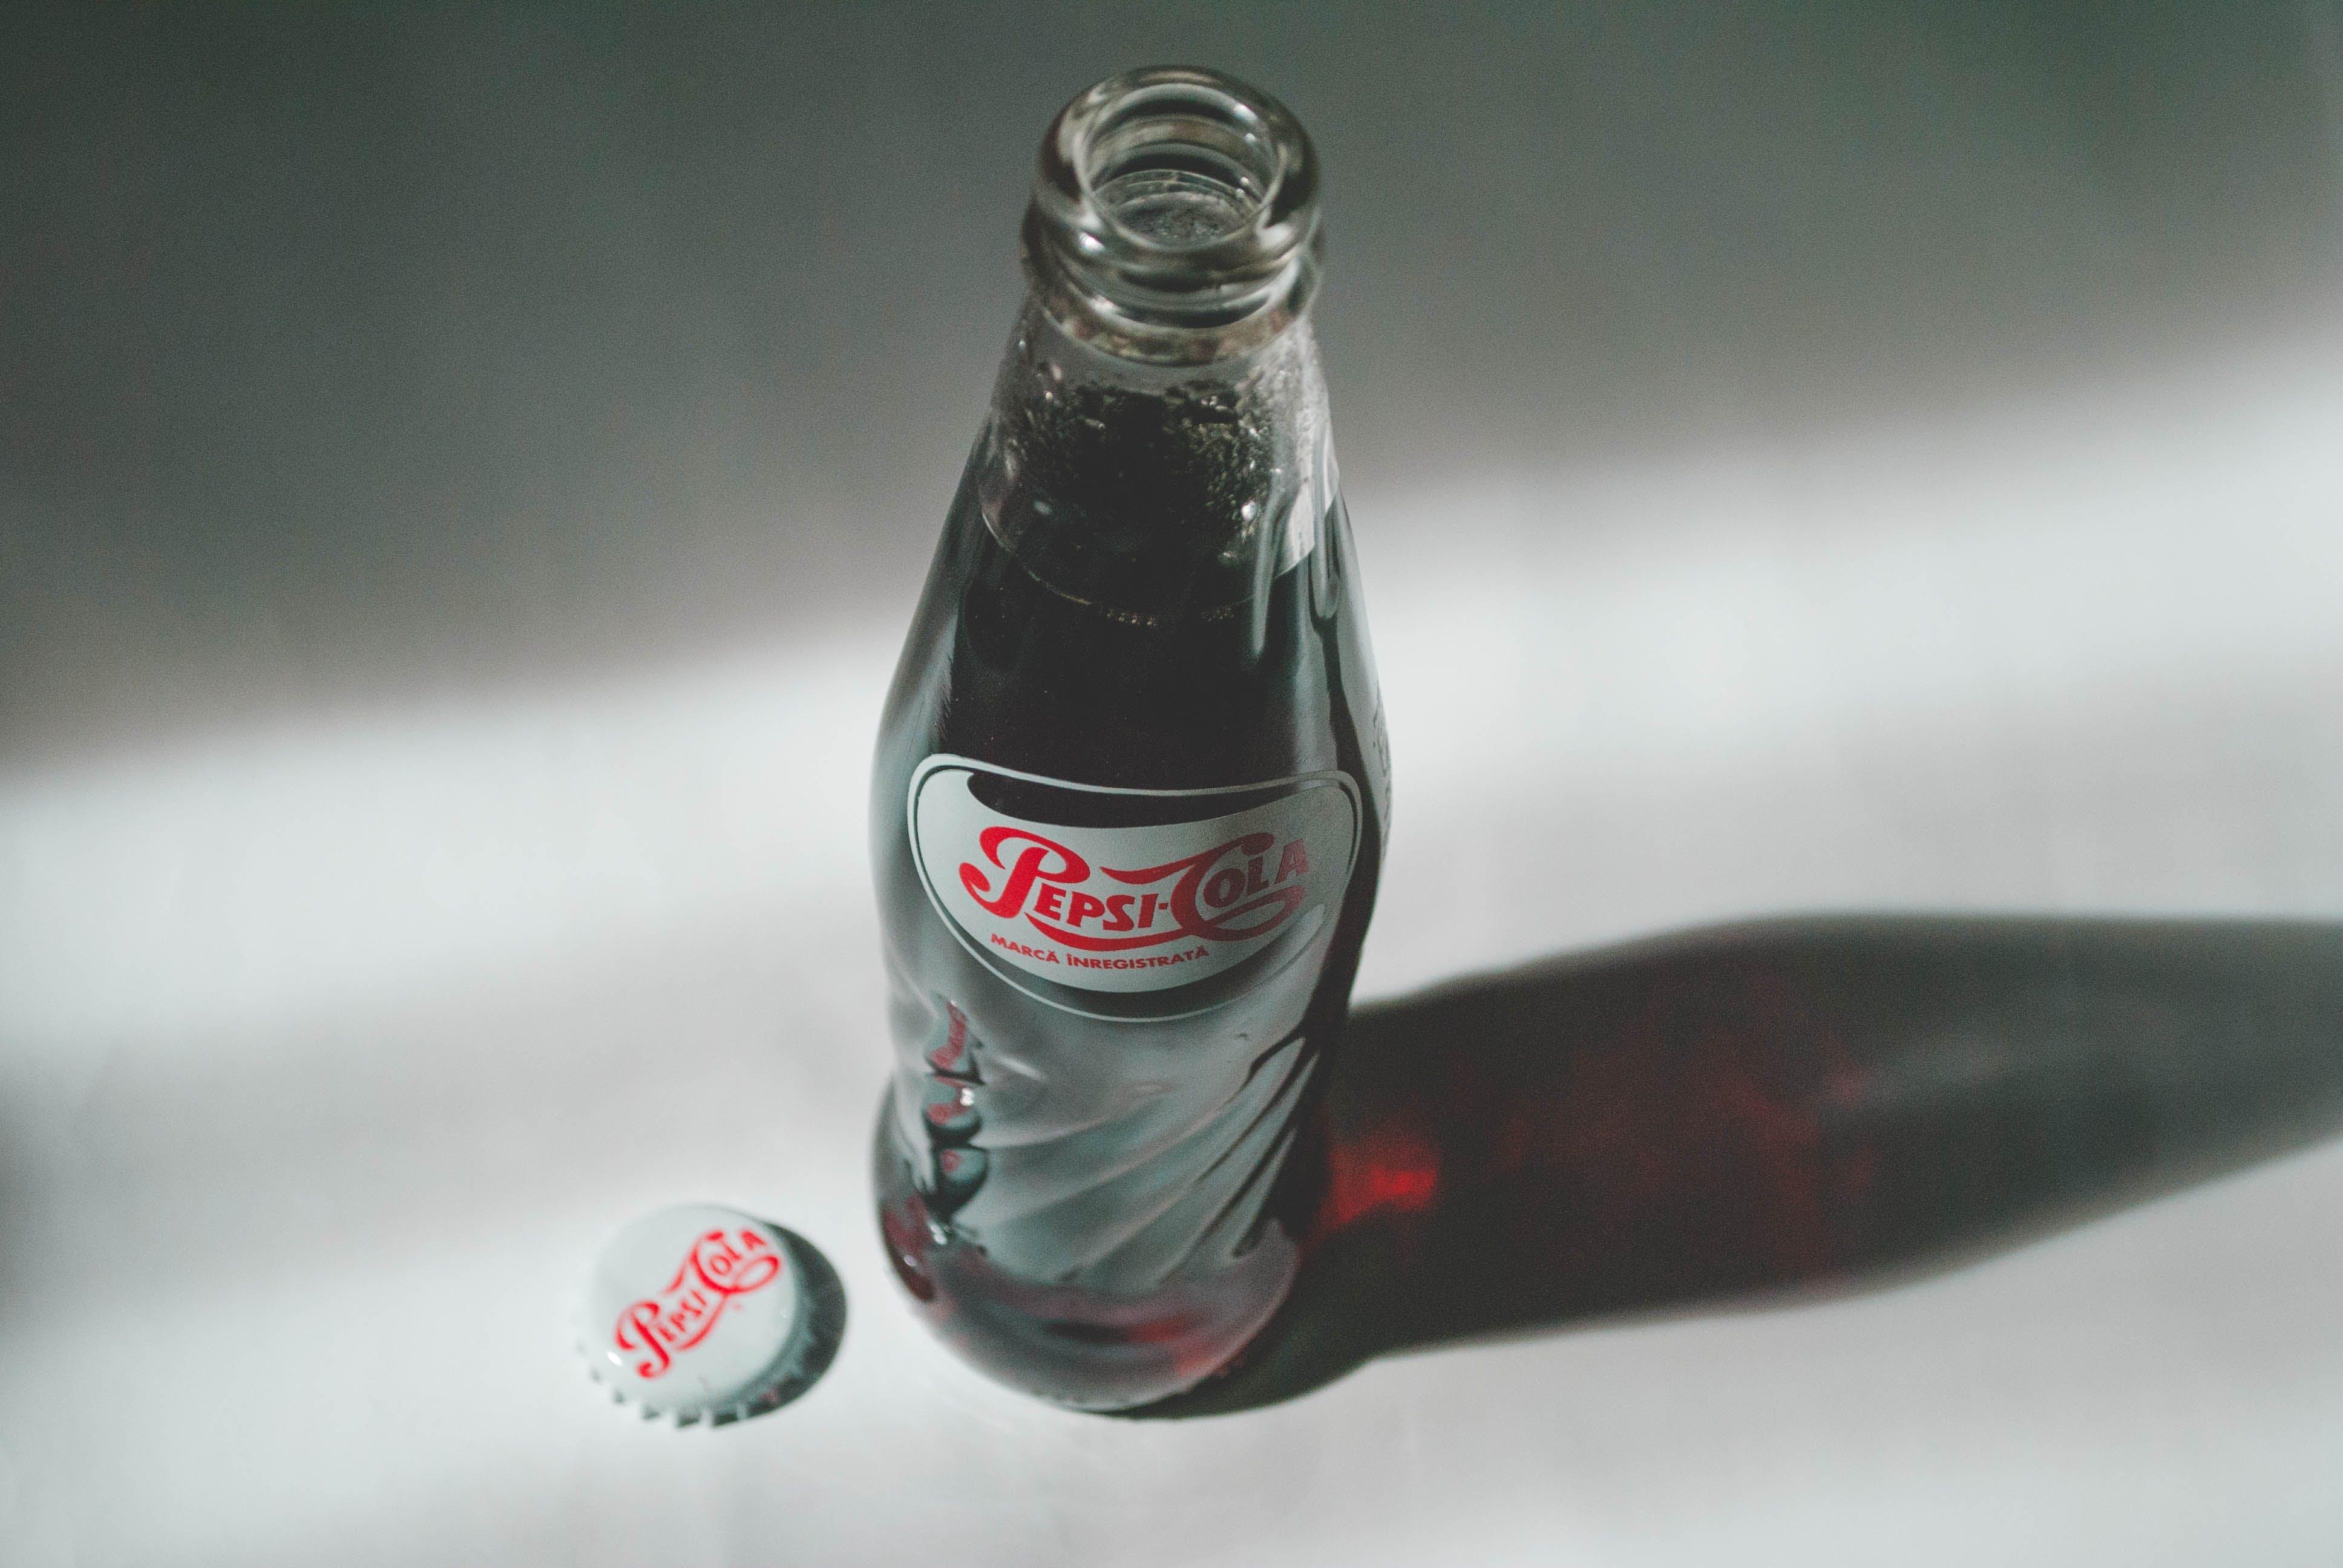 Pepsi-cola Soda Bottle on White Surface